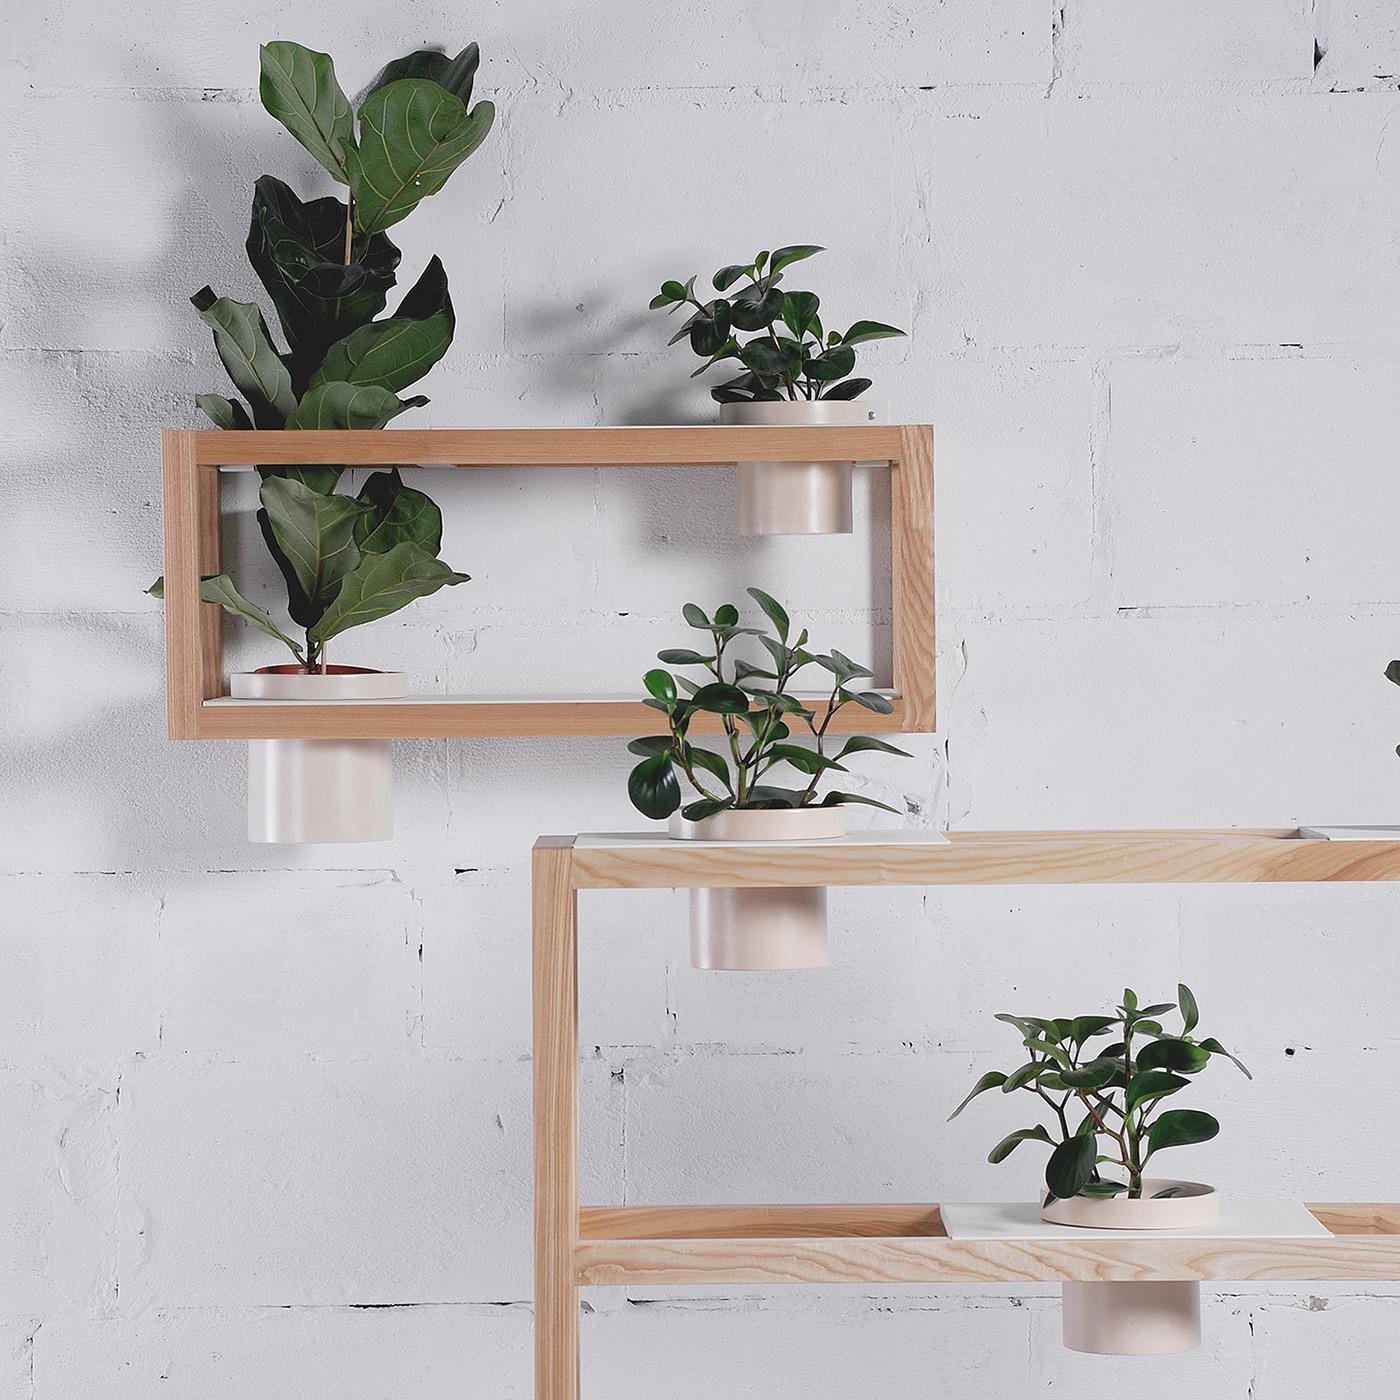 Projet Etudiant : Hanging Garden Planters la console par Dariya Stadnichenko